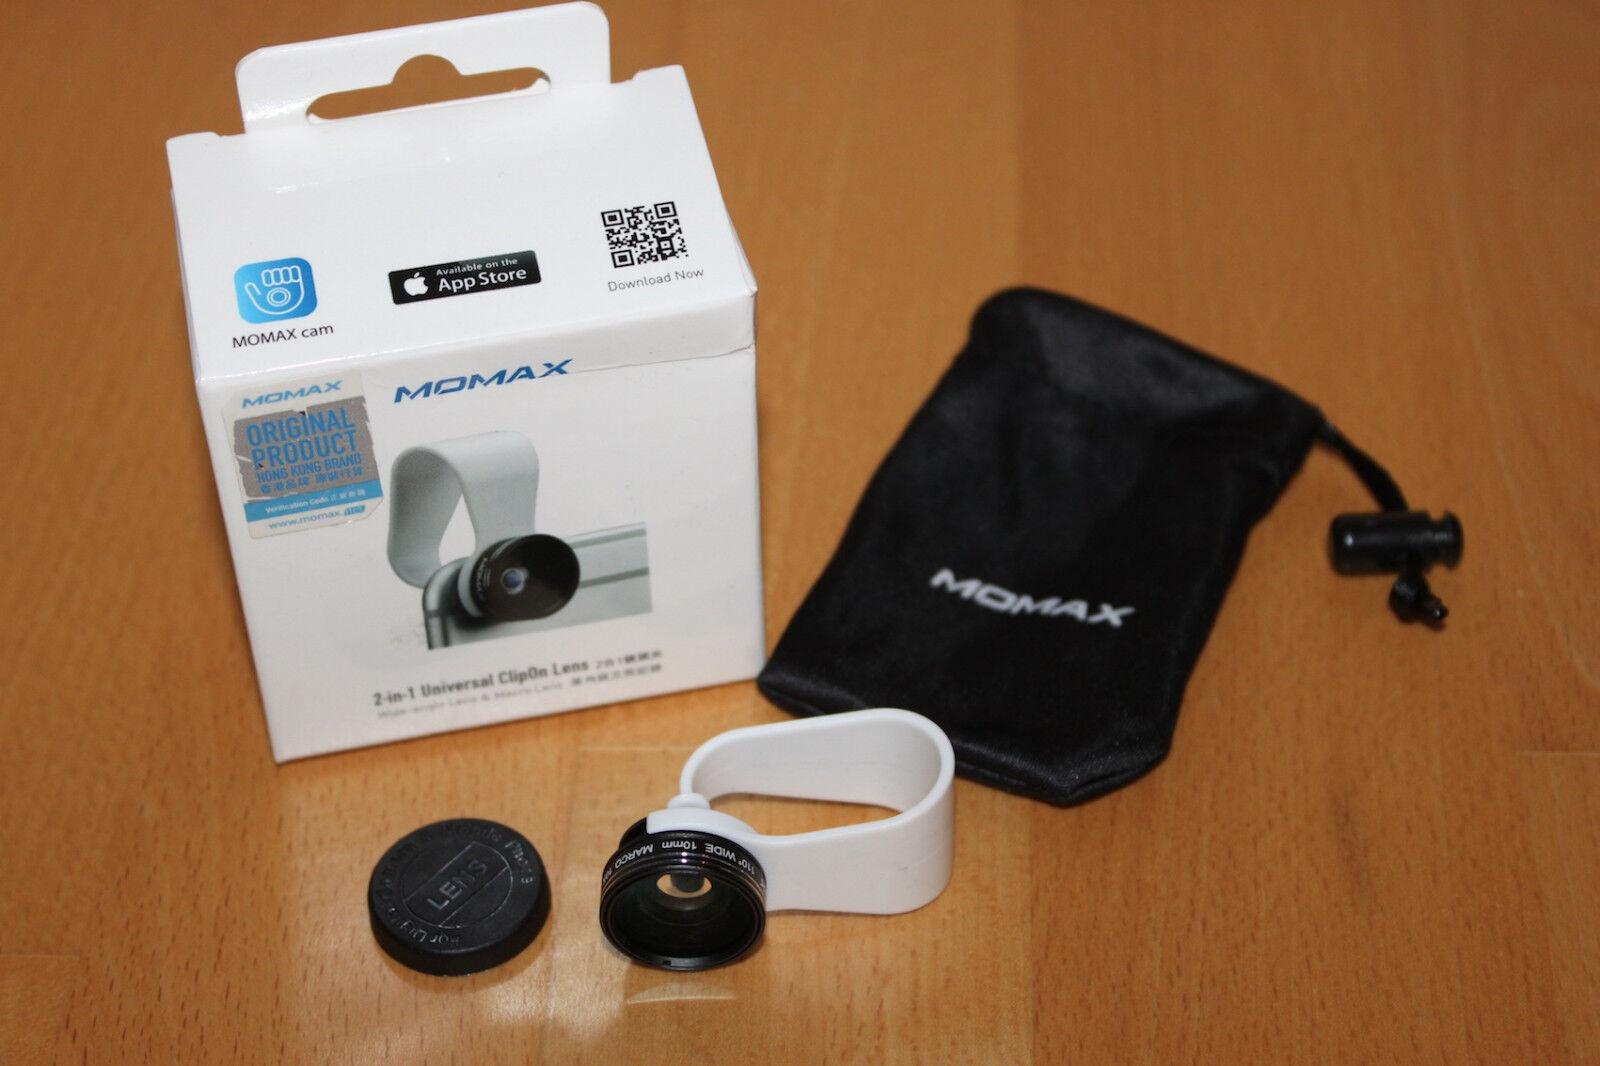 MOMAX – Universal 2-in-1 Clipon-Lens/Smartphone Photo-Linse Neu & OVP – AppStore